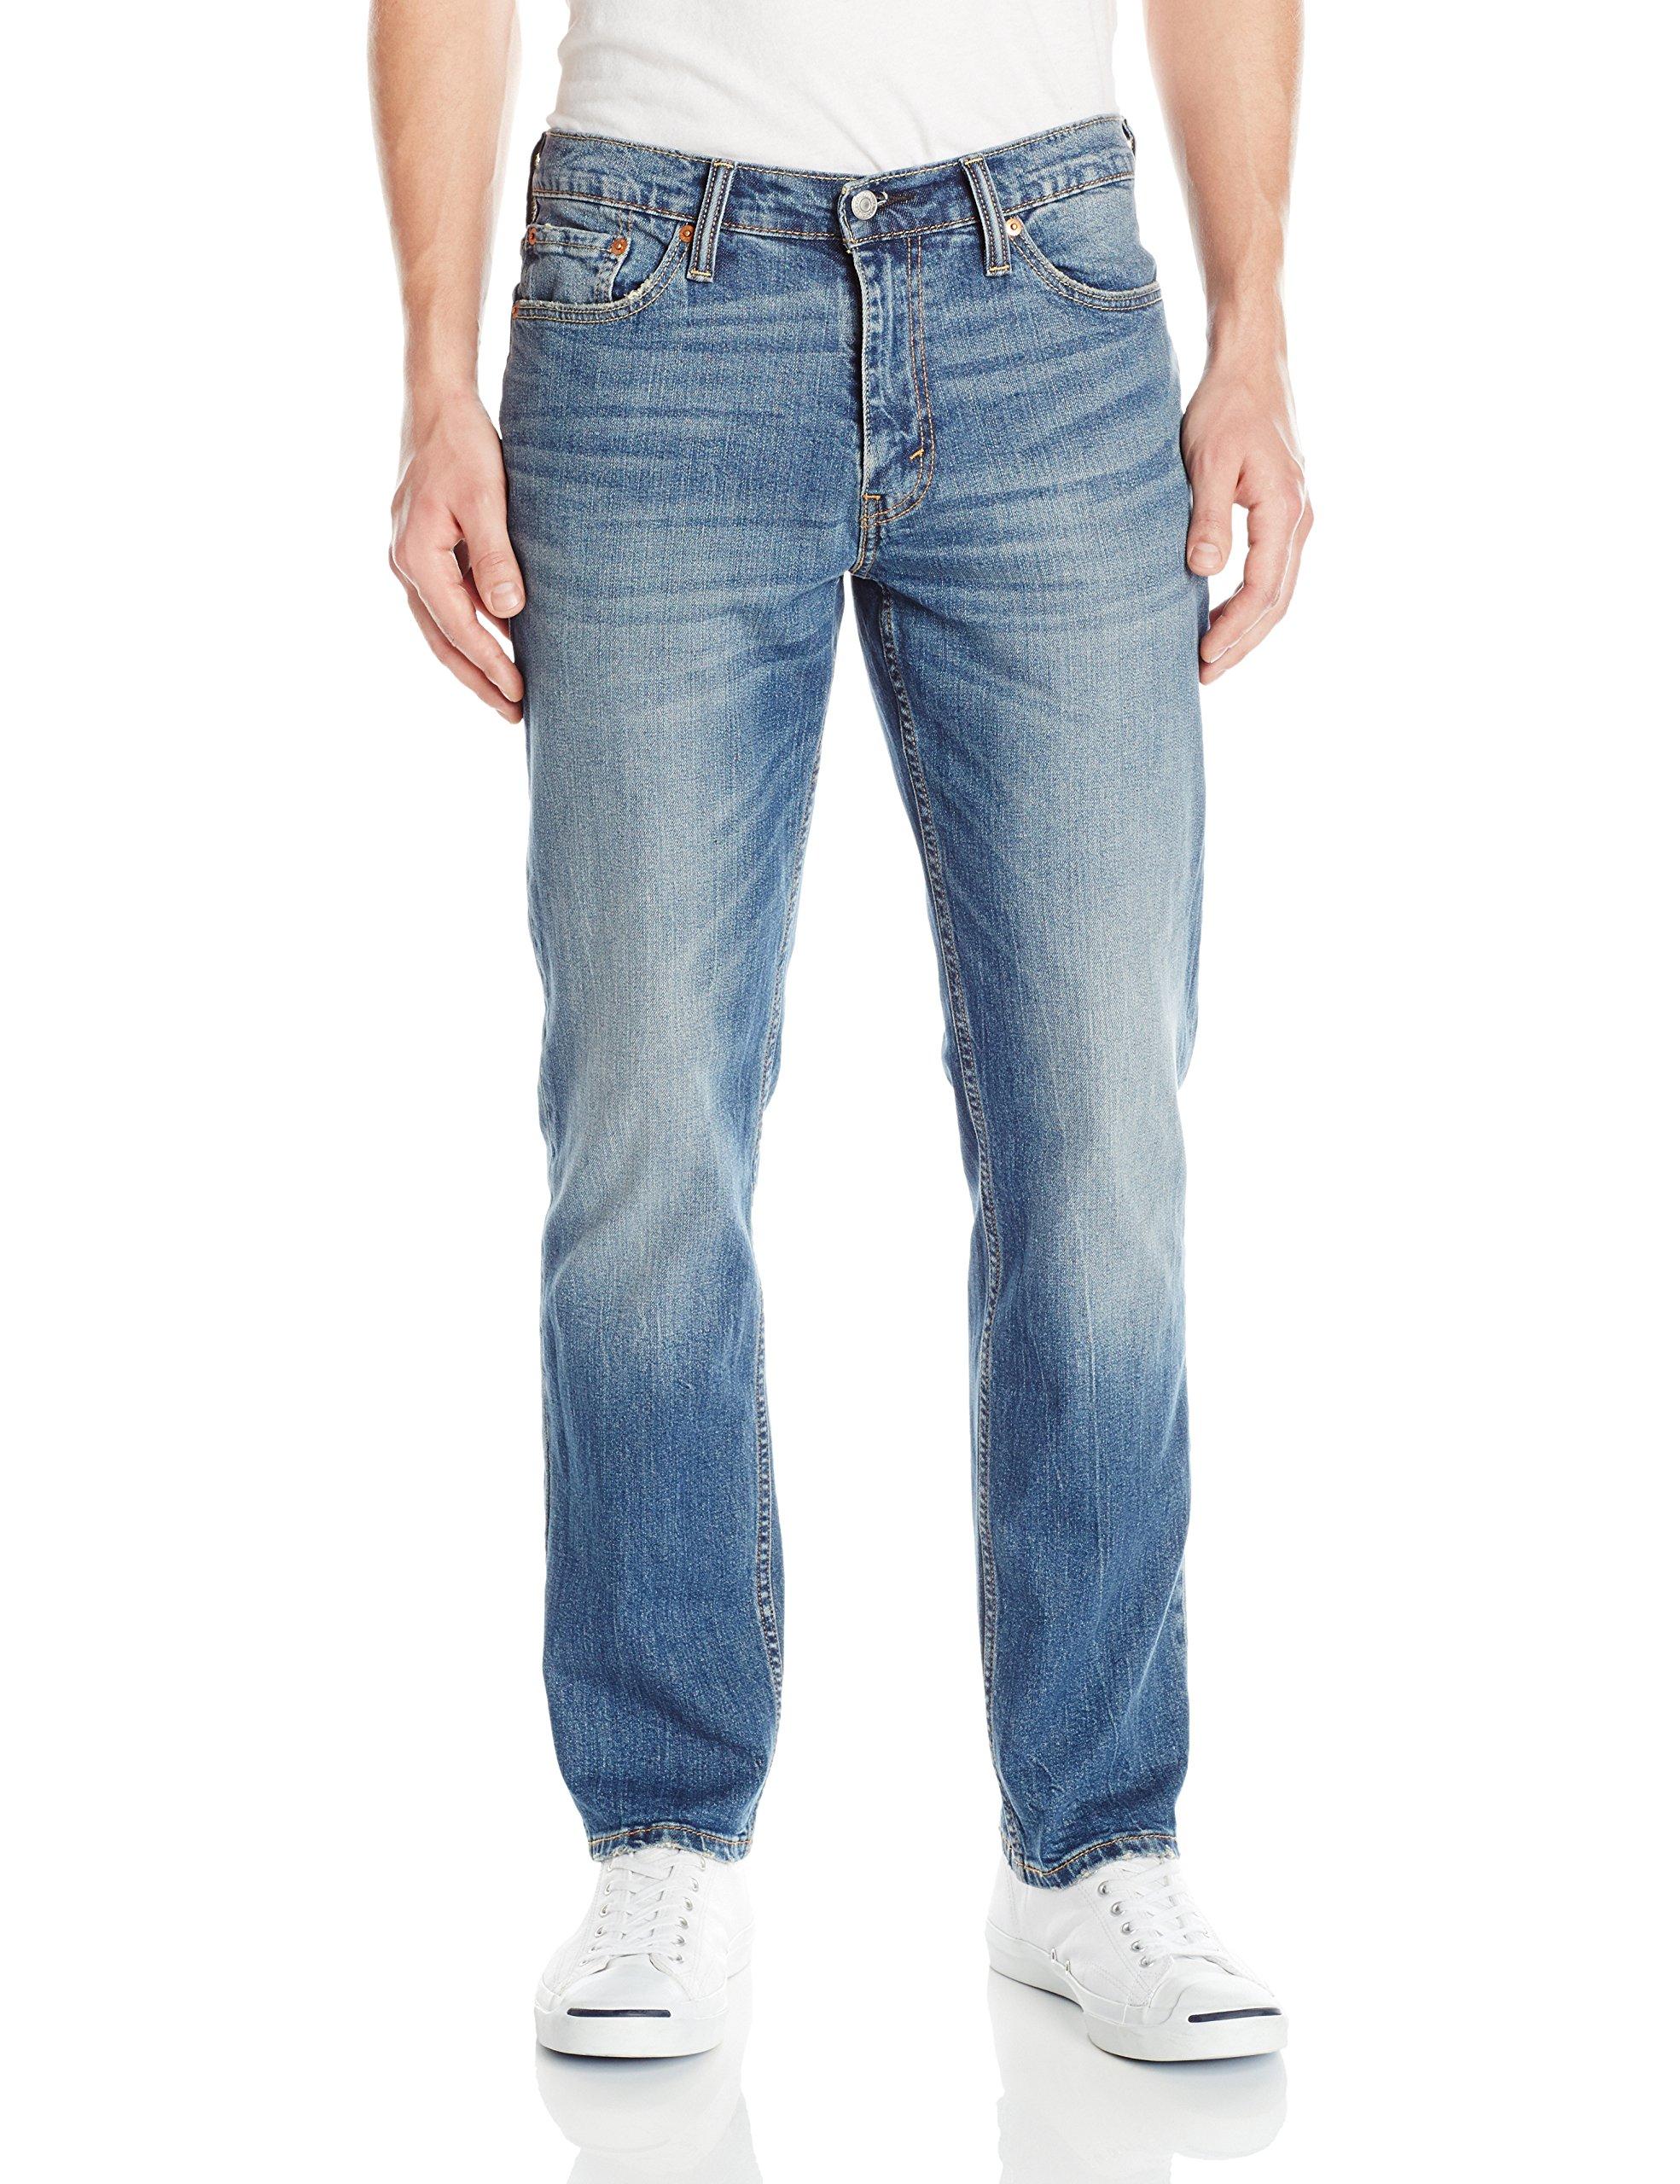 Levi's Men's 541 Athletic Straight Fit Jean, Desperado - Stretch 34x30